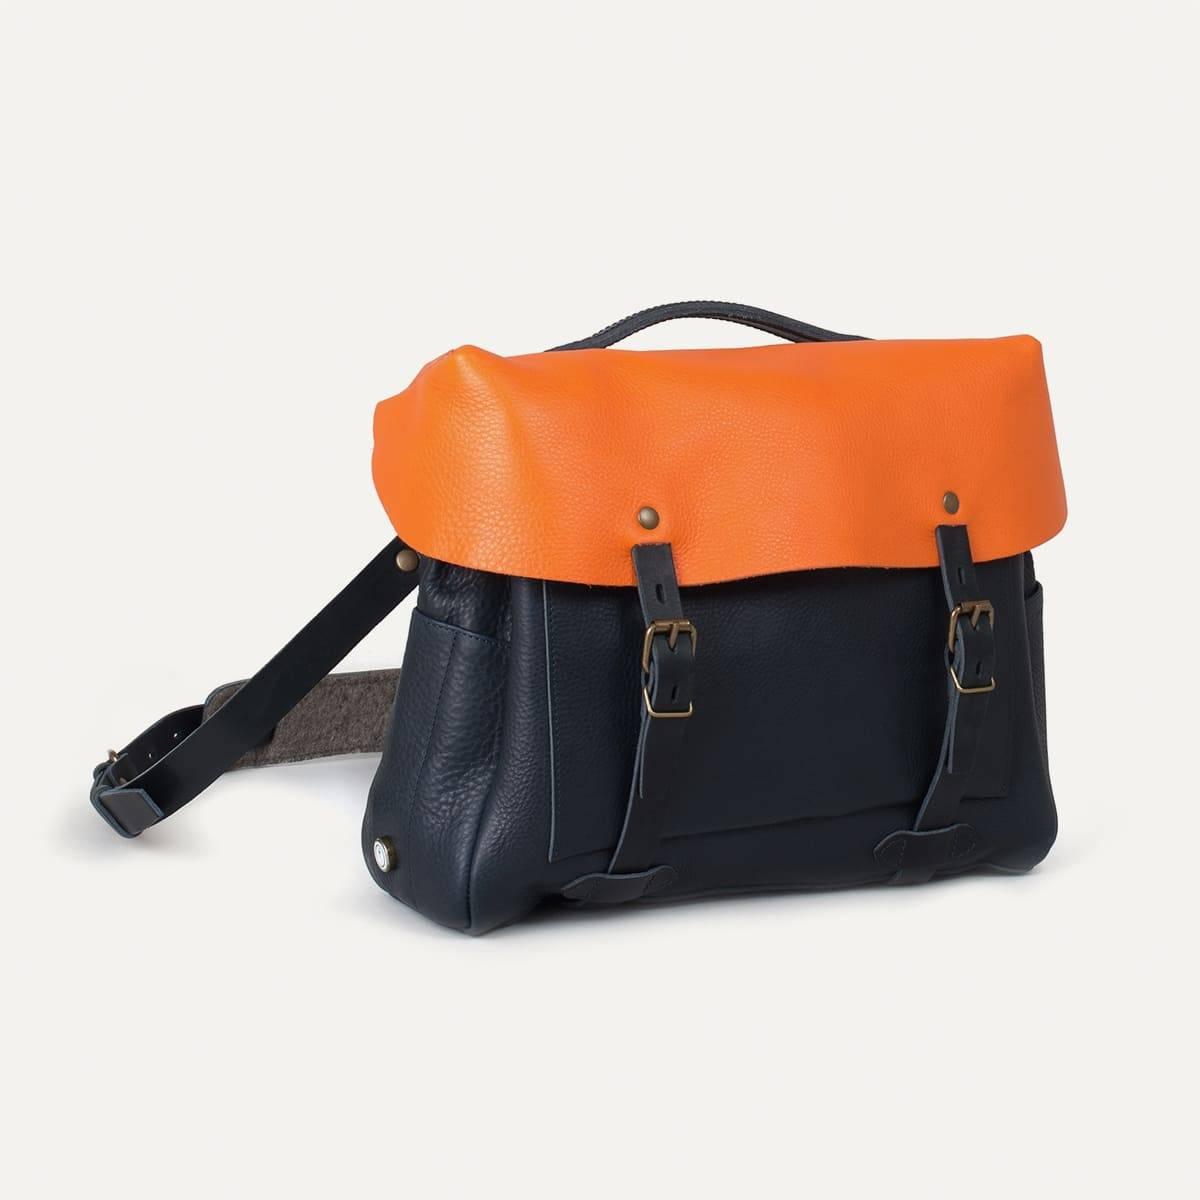 Sac Eclair Bleu de Chauffe x Blitz - Navy/Orange (image n°2)